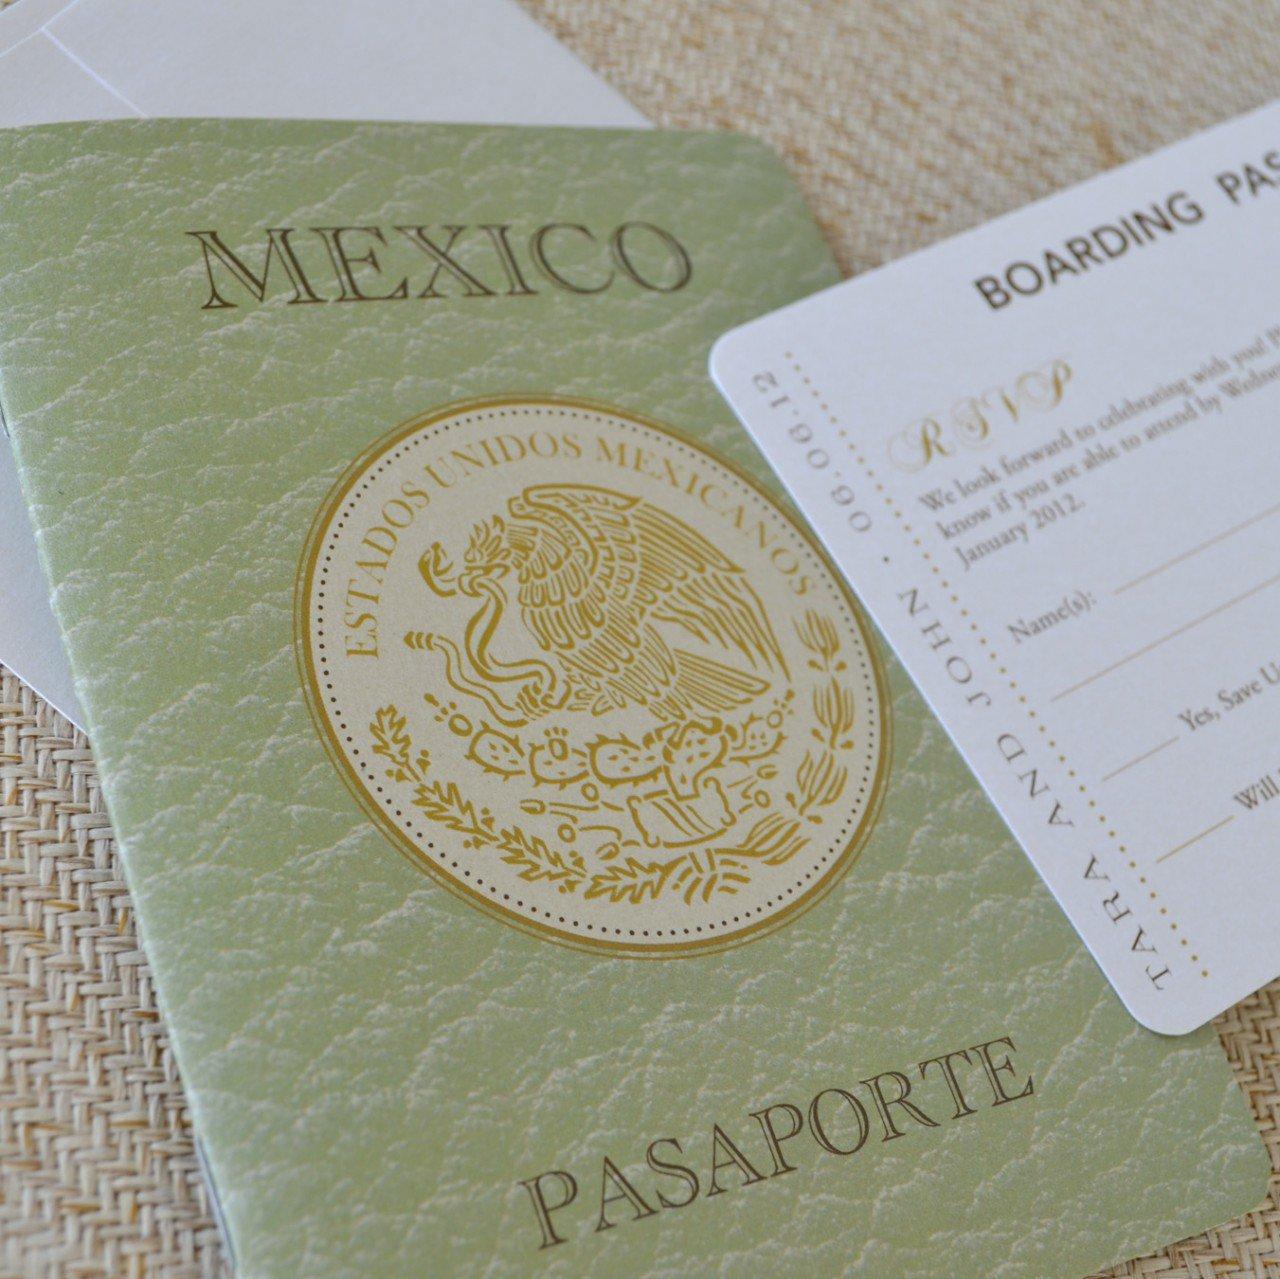 Mexico Passport Wedding Invitations